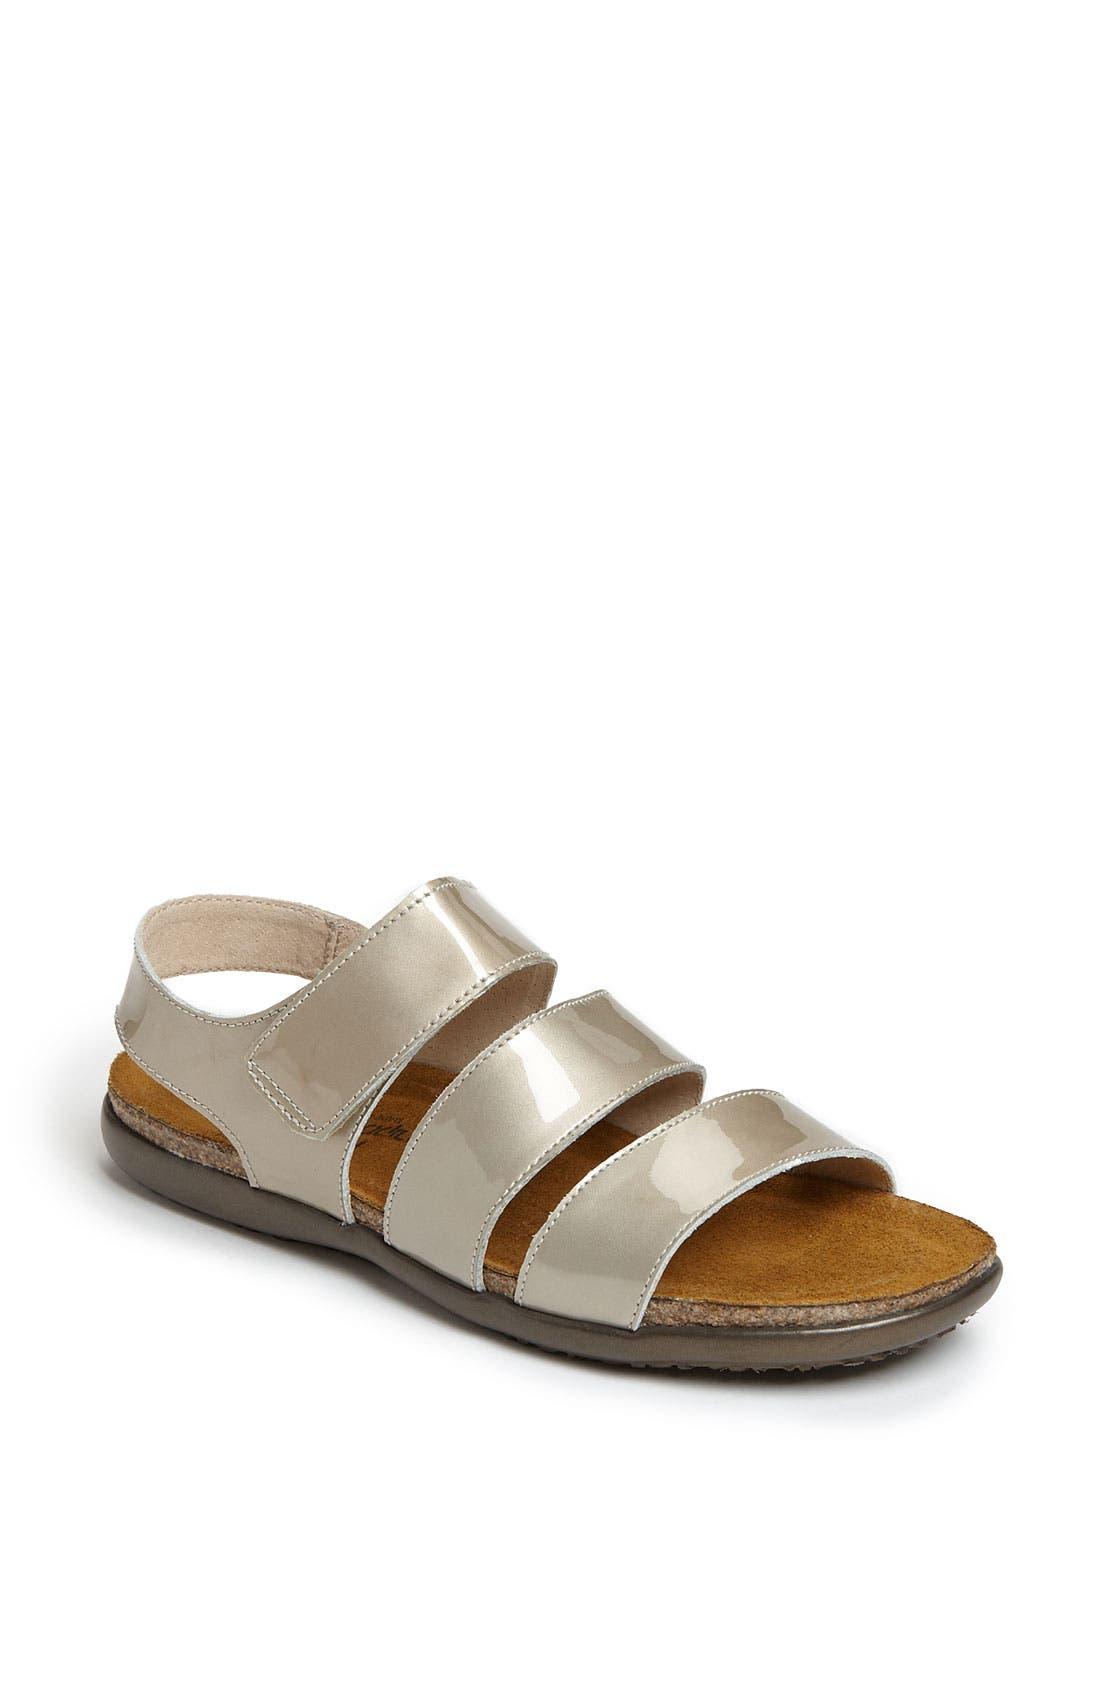 Alternate Image 1 Selected - Naot 'Laura' Sandal